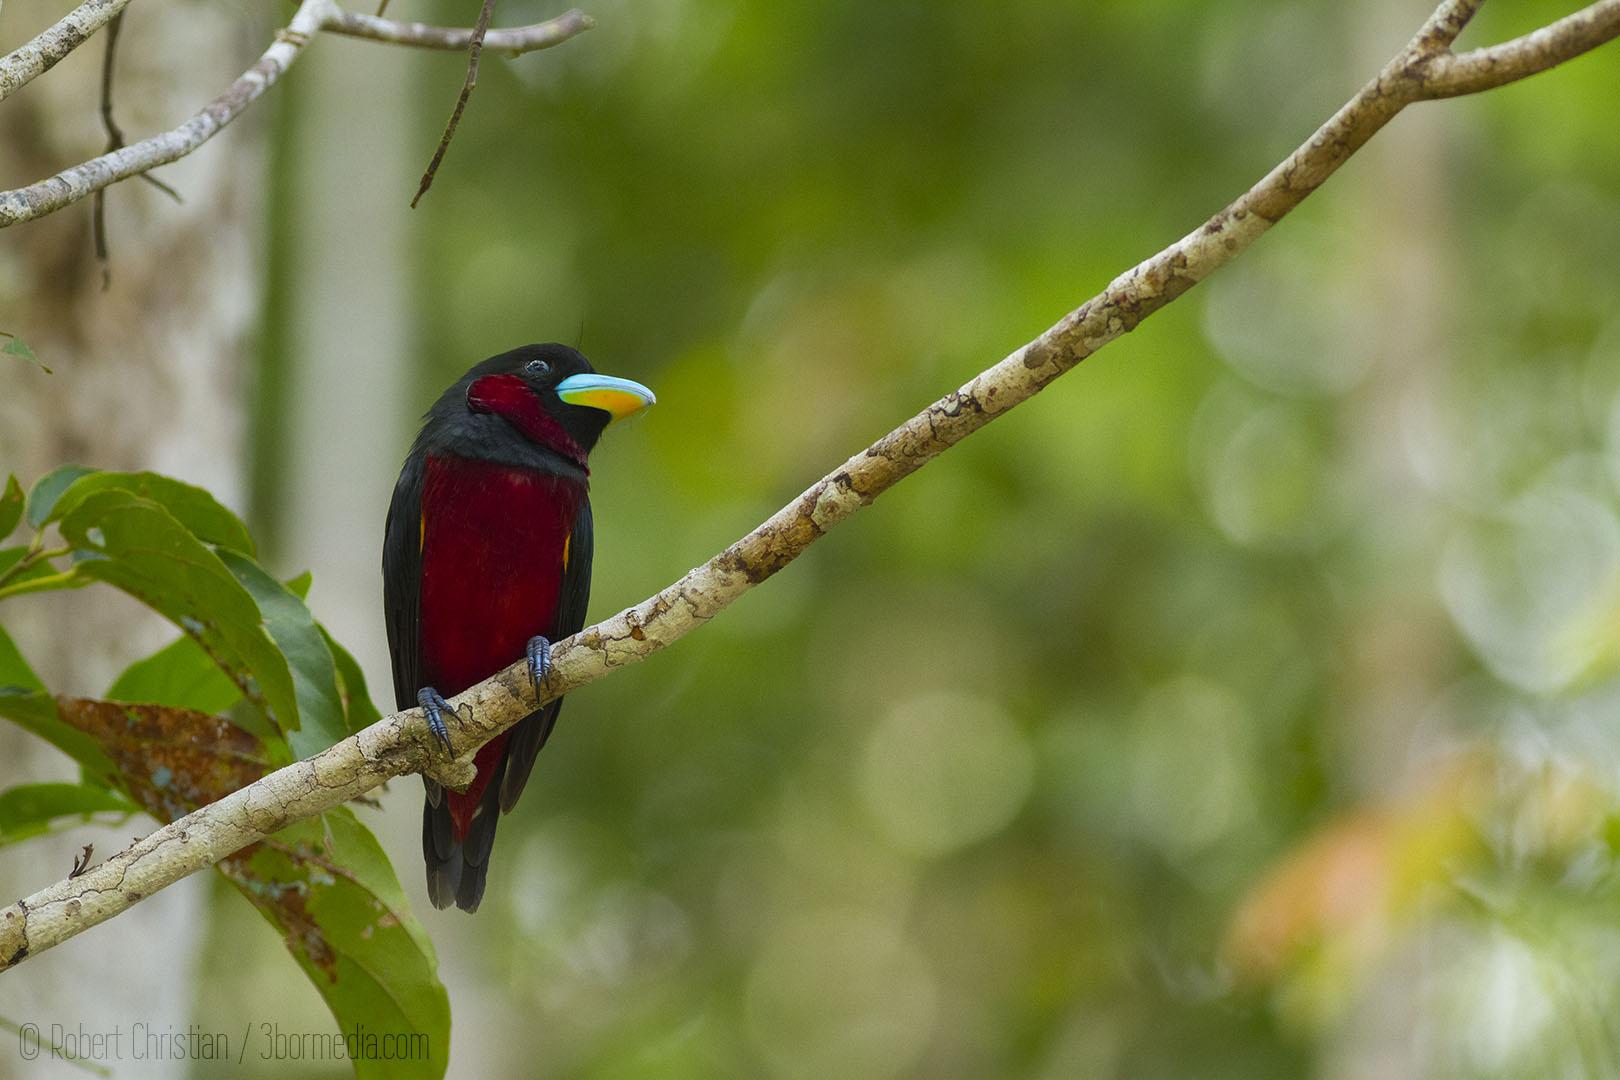 Black-and-red Broadbill